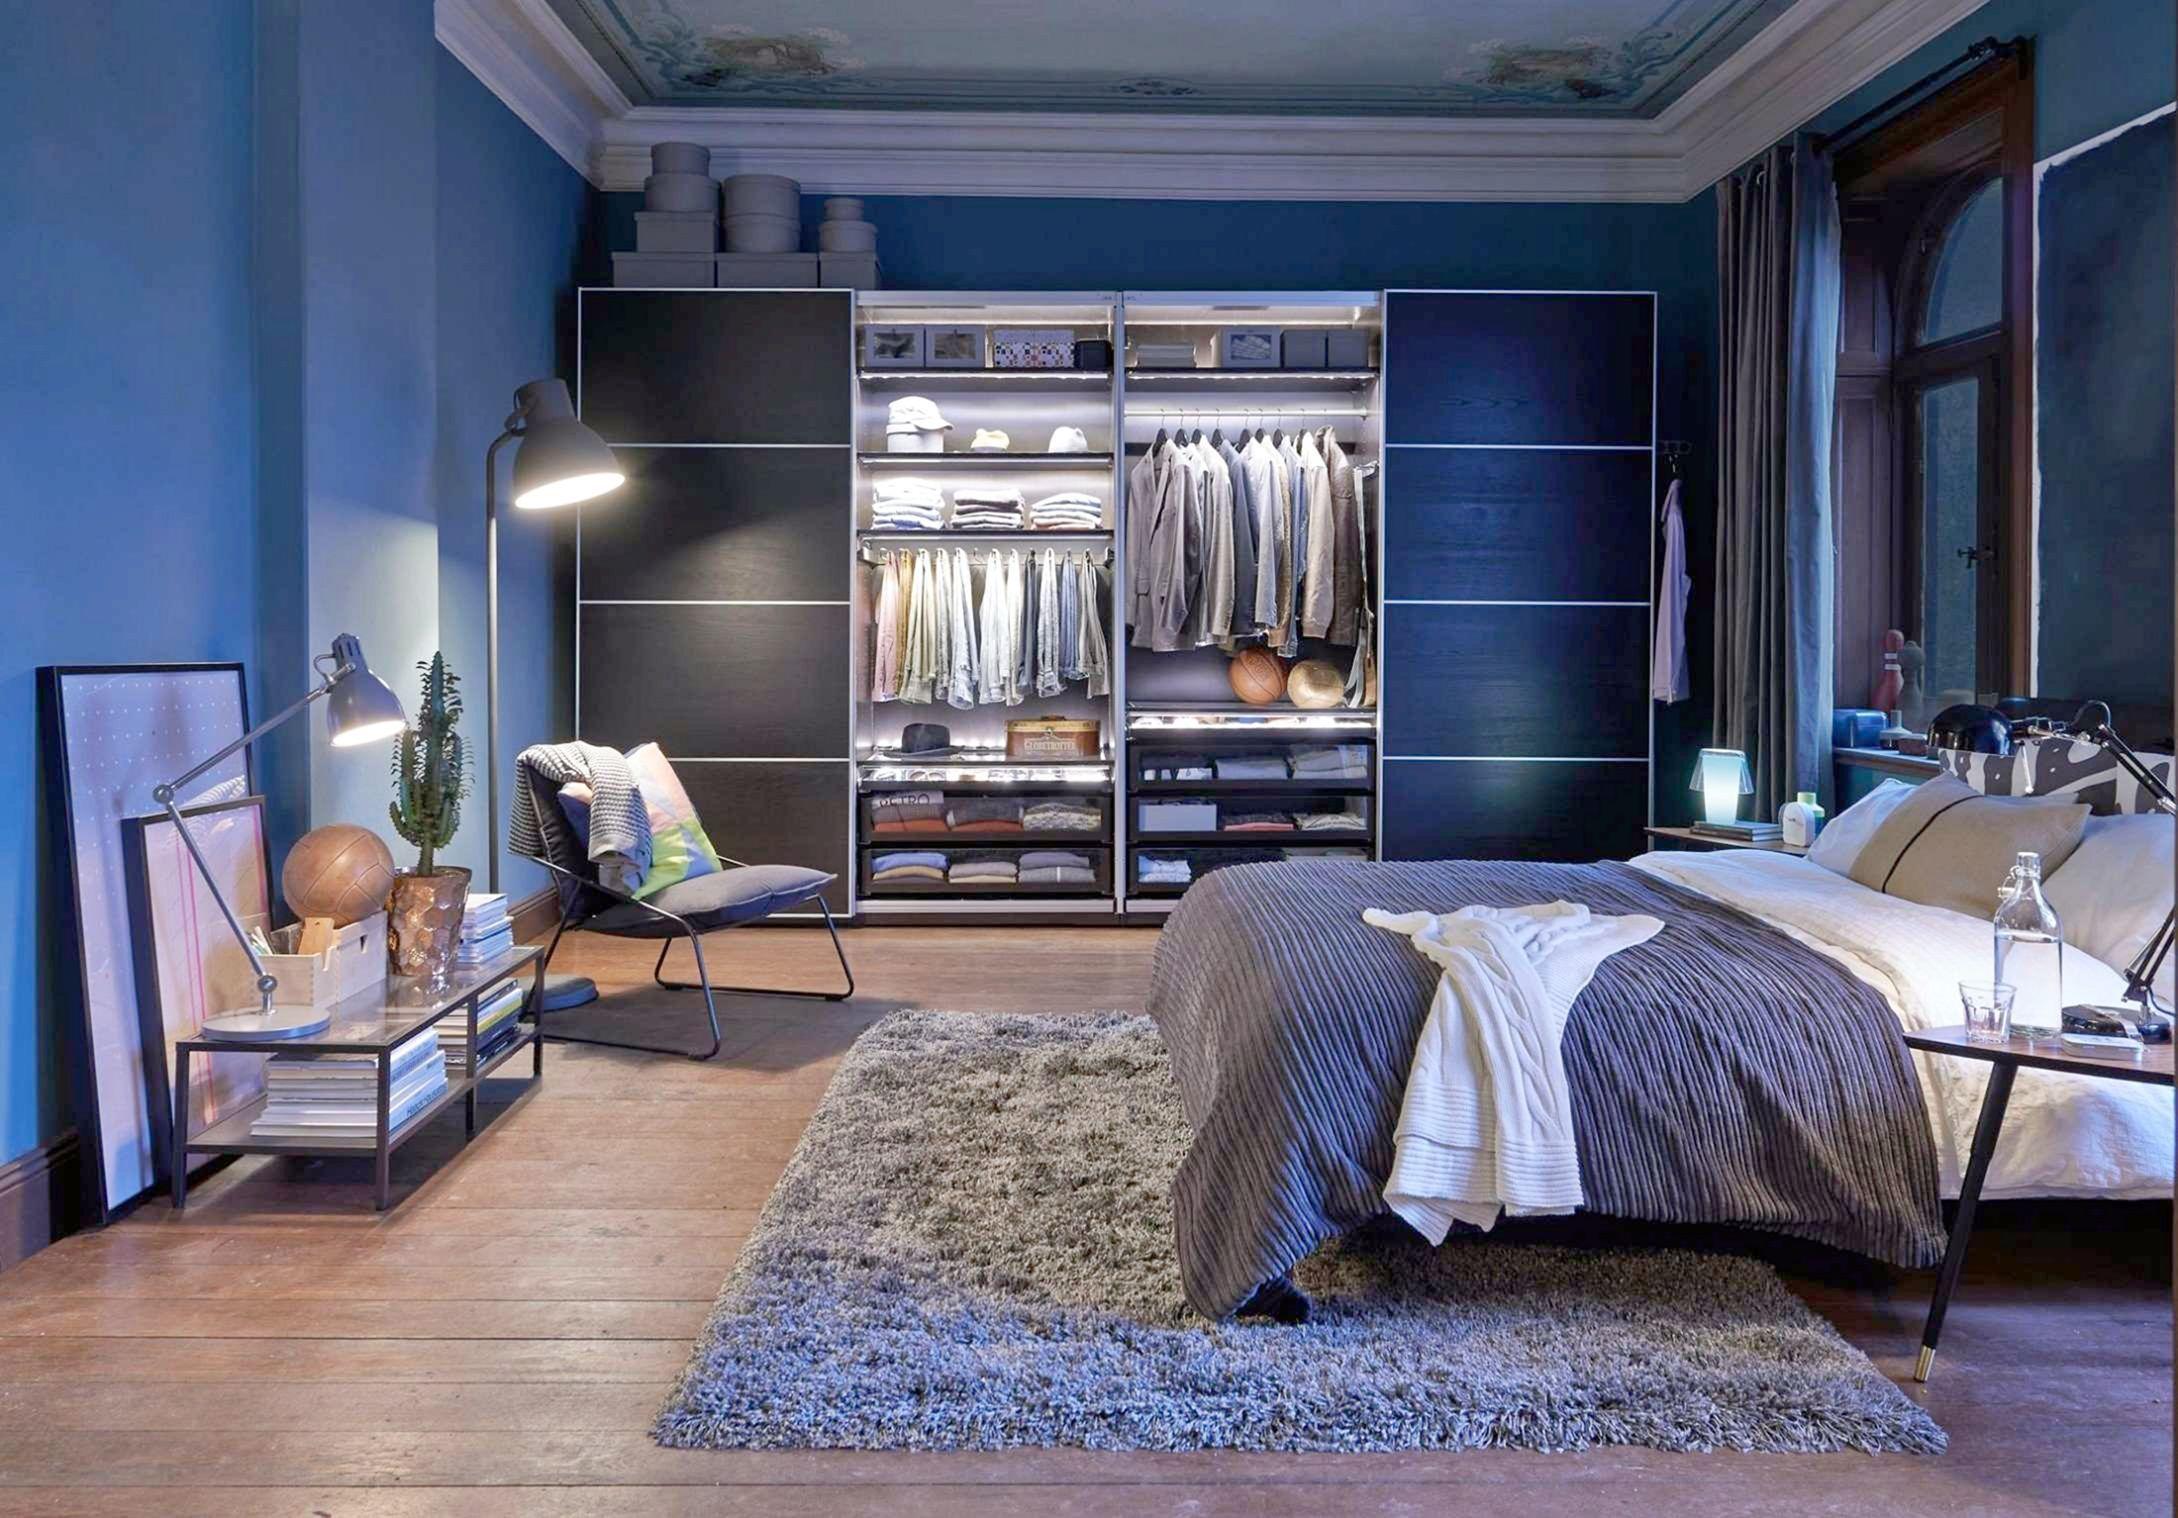 Elegant 10 Masculine Bedroom Ideas For Single Men in 2020 ...